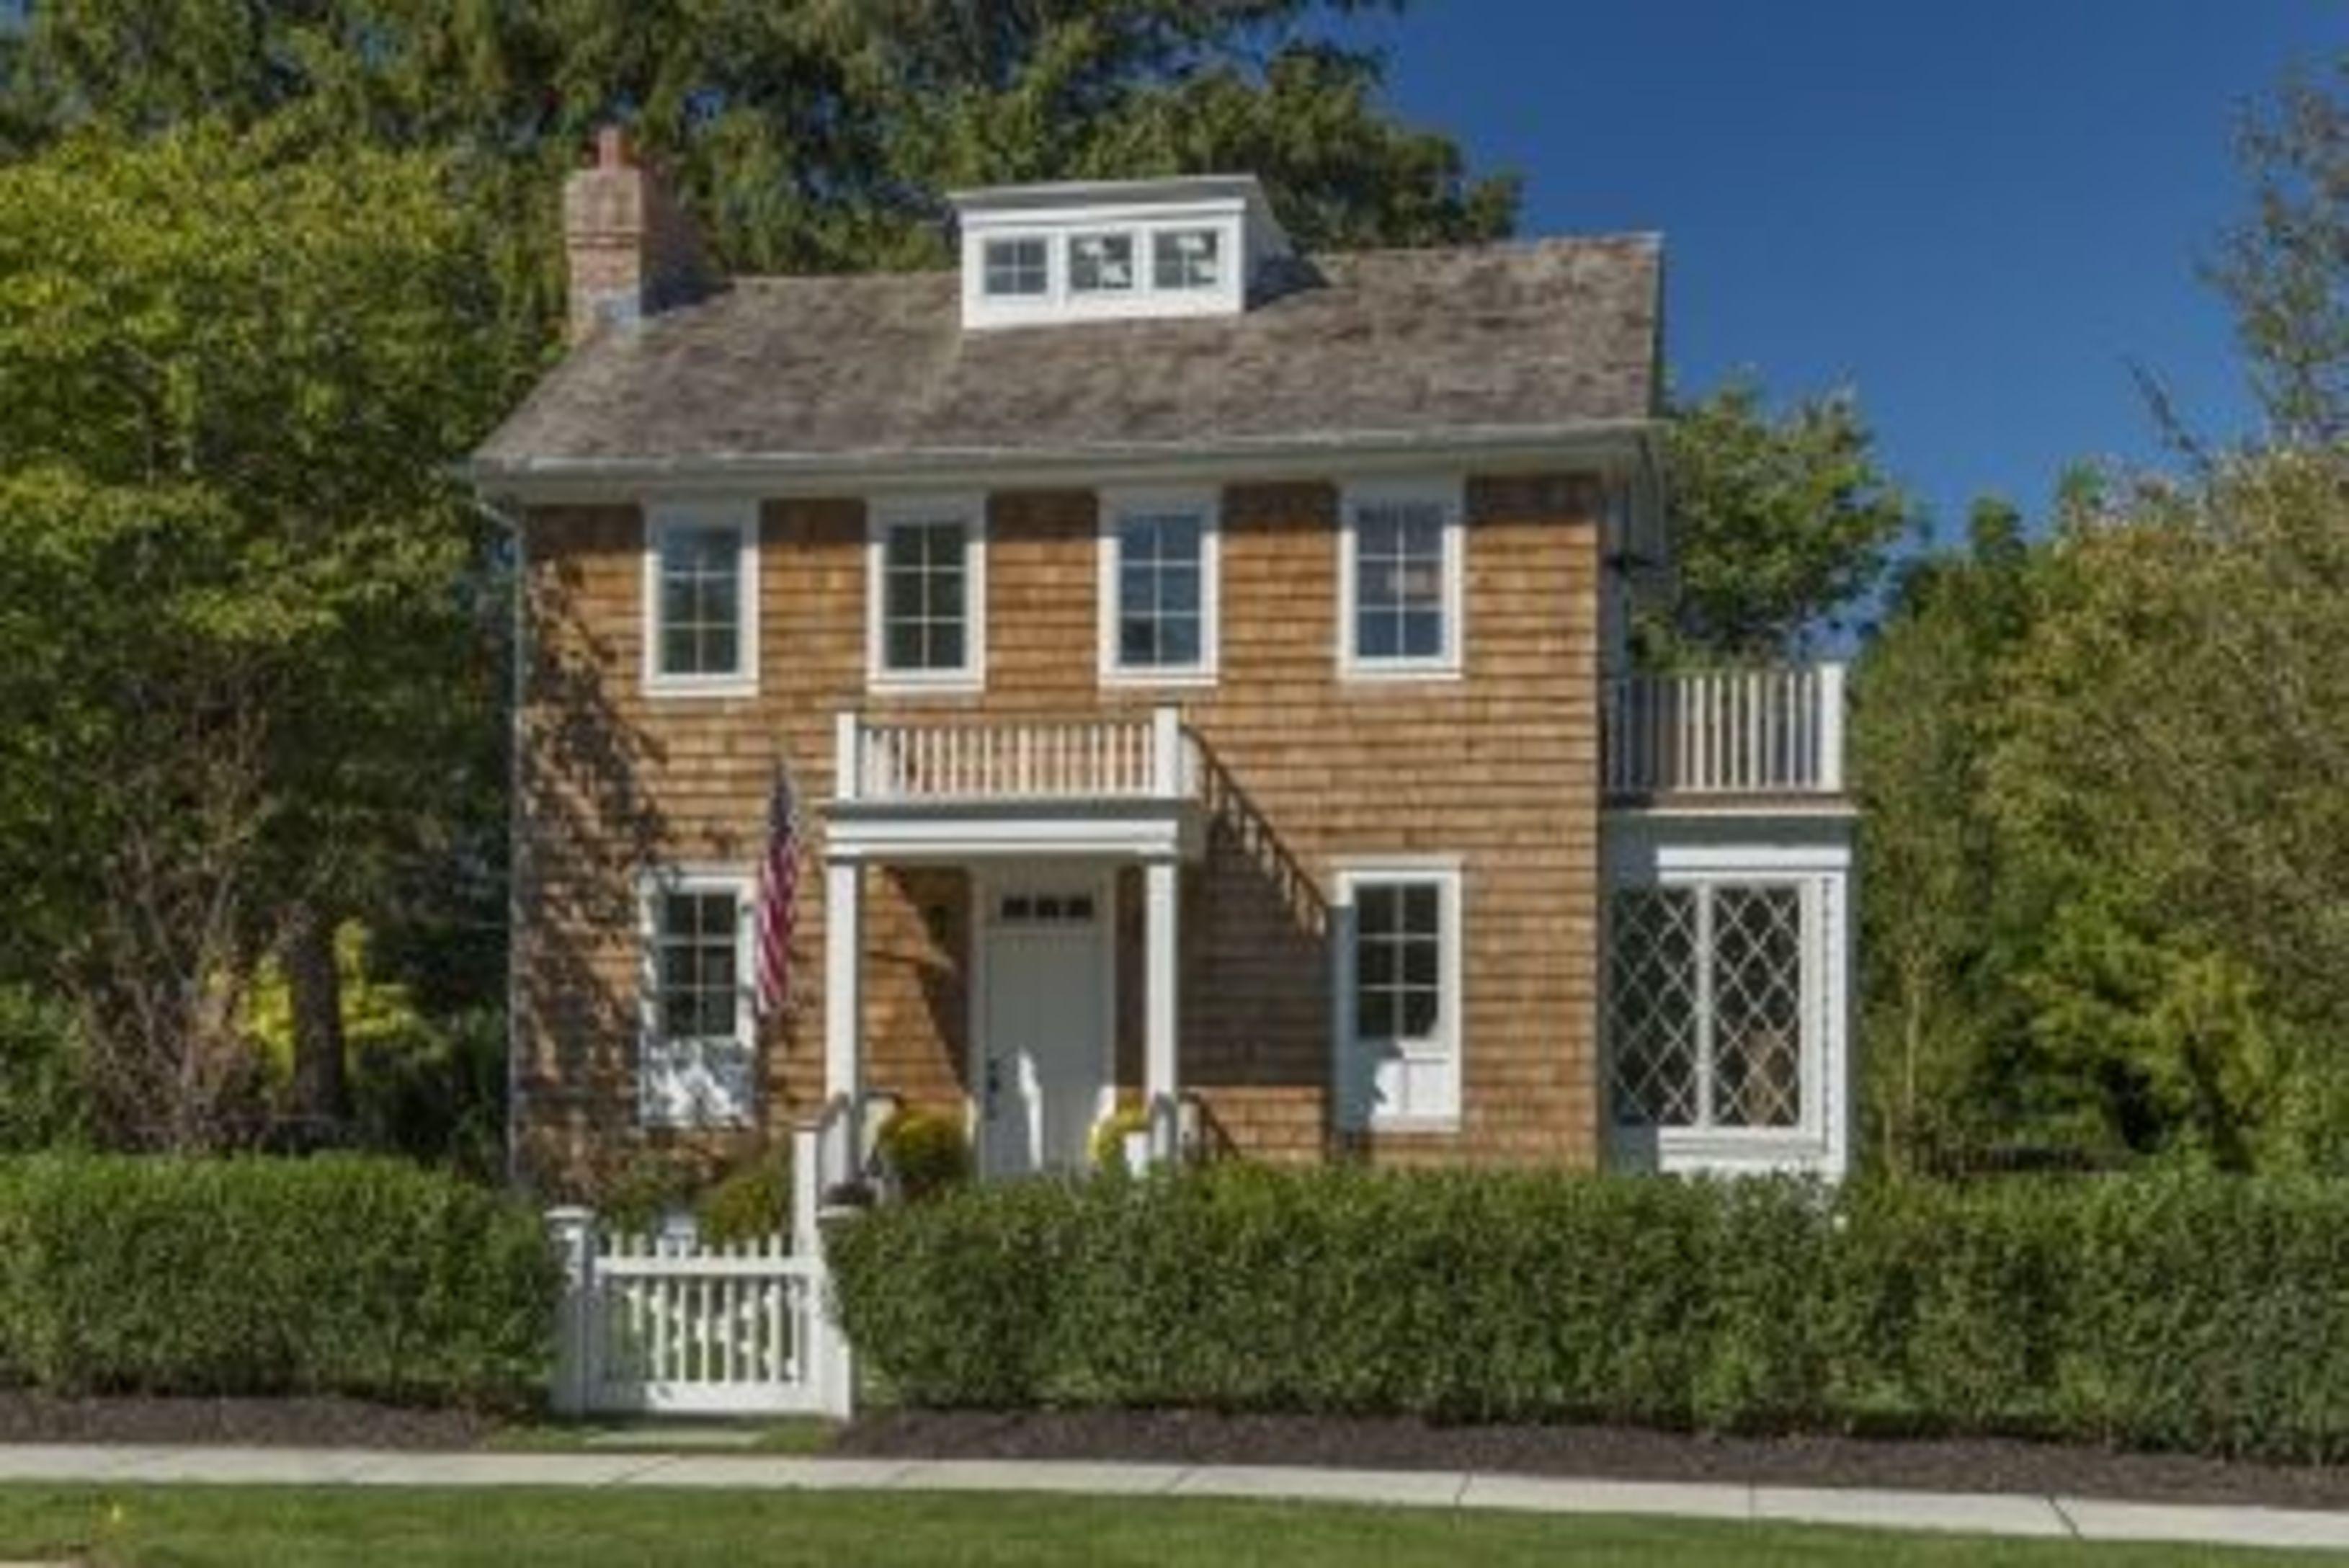 7 Sherrill Rd - East Hampton Village, New York